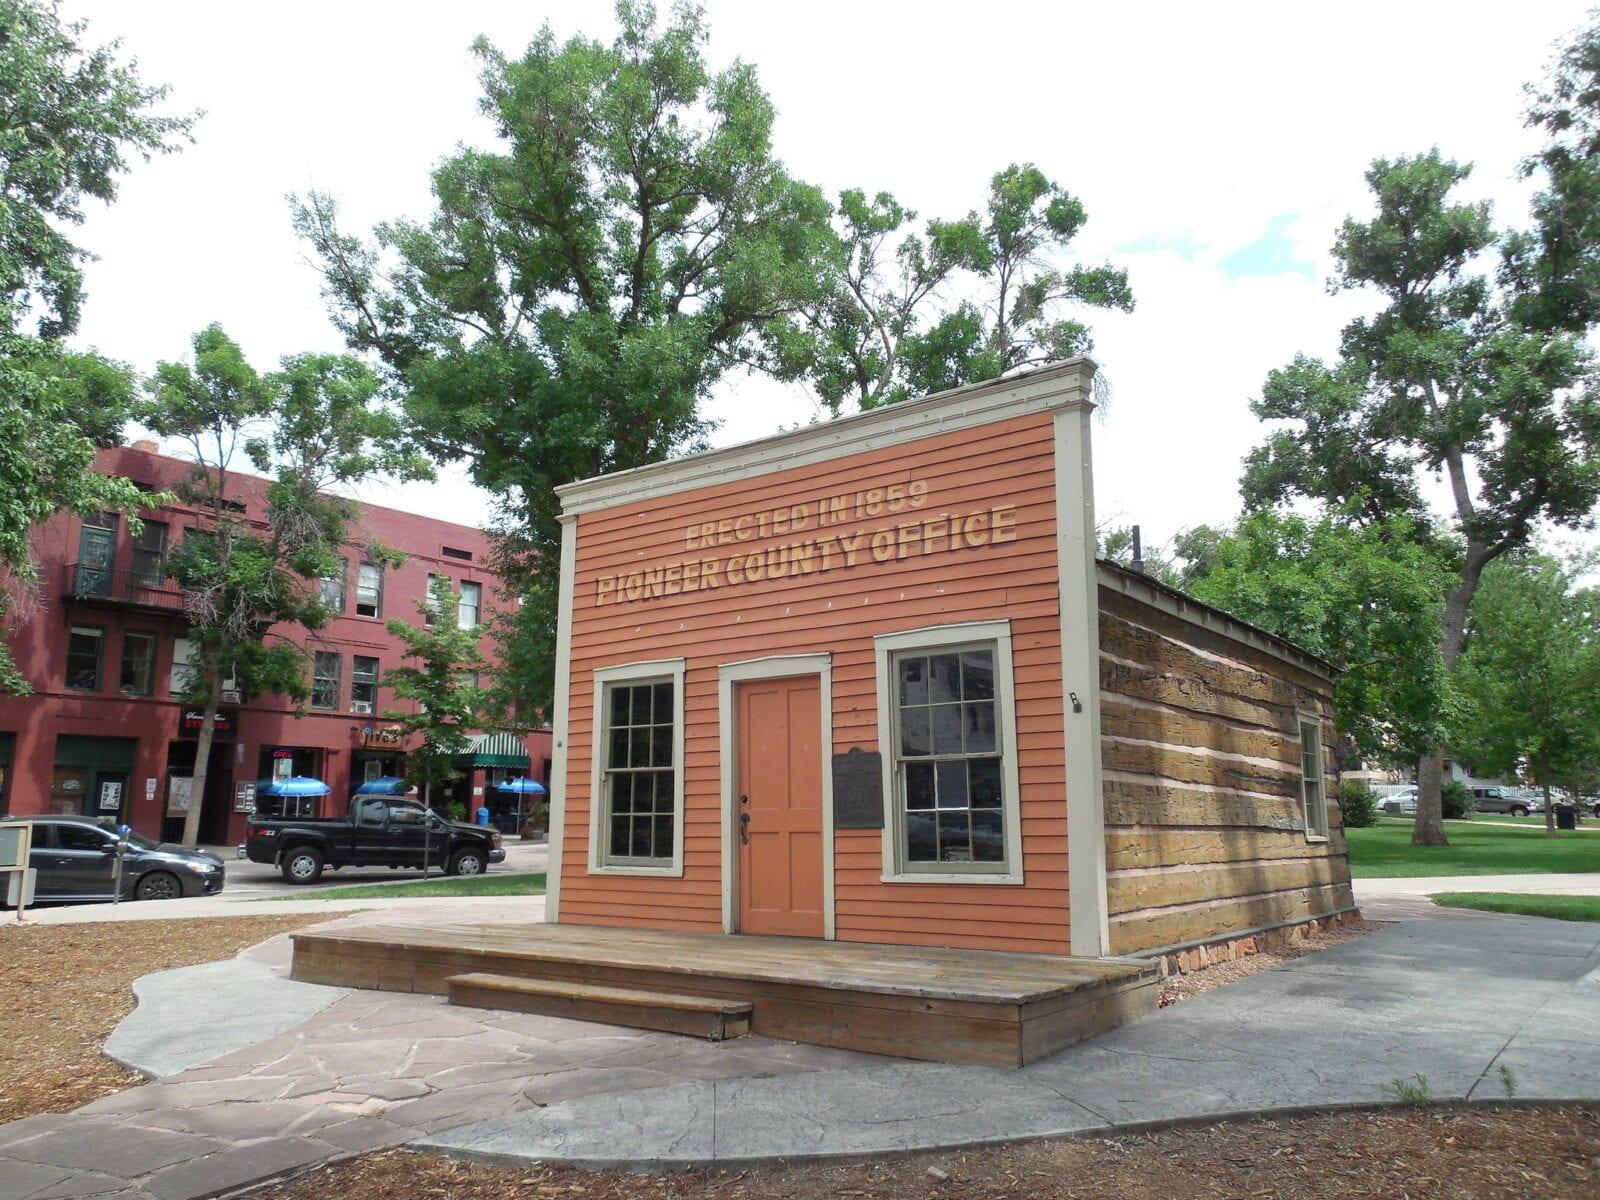 Image of the Pioneer County Office in the Bancroft Park in Colorado Springs, Colorado